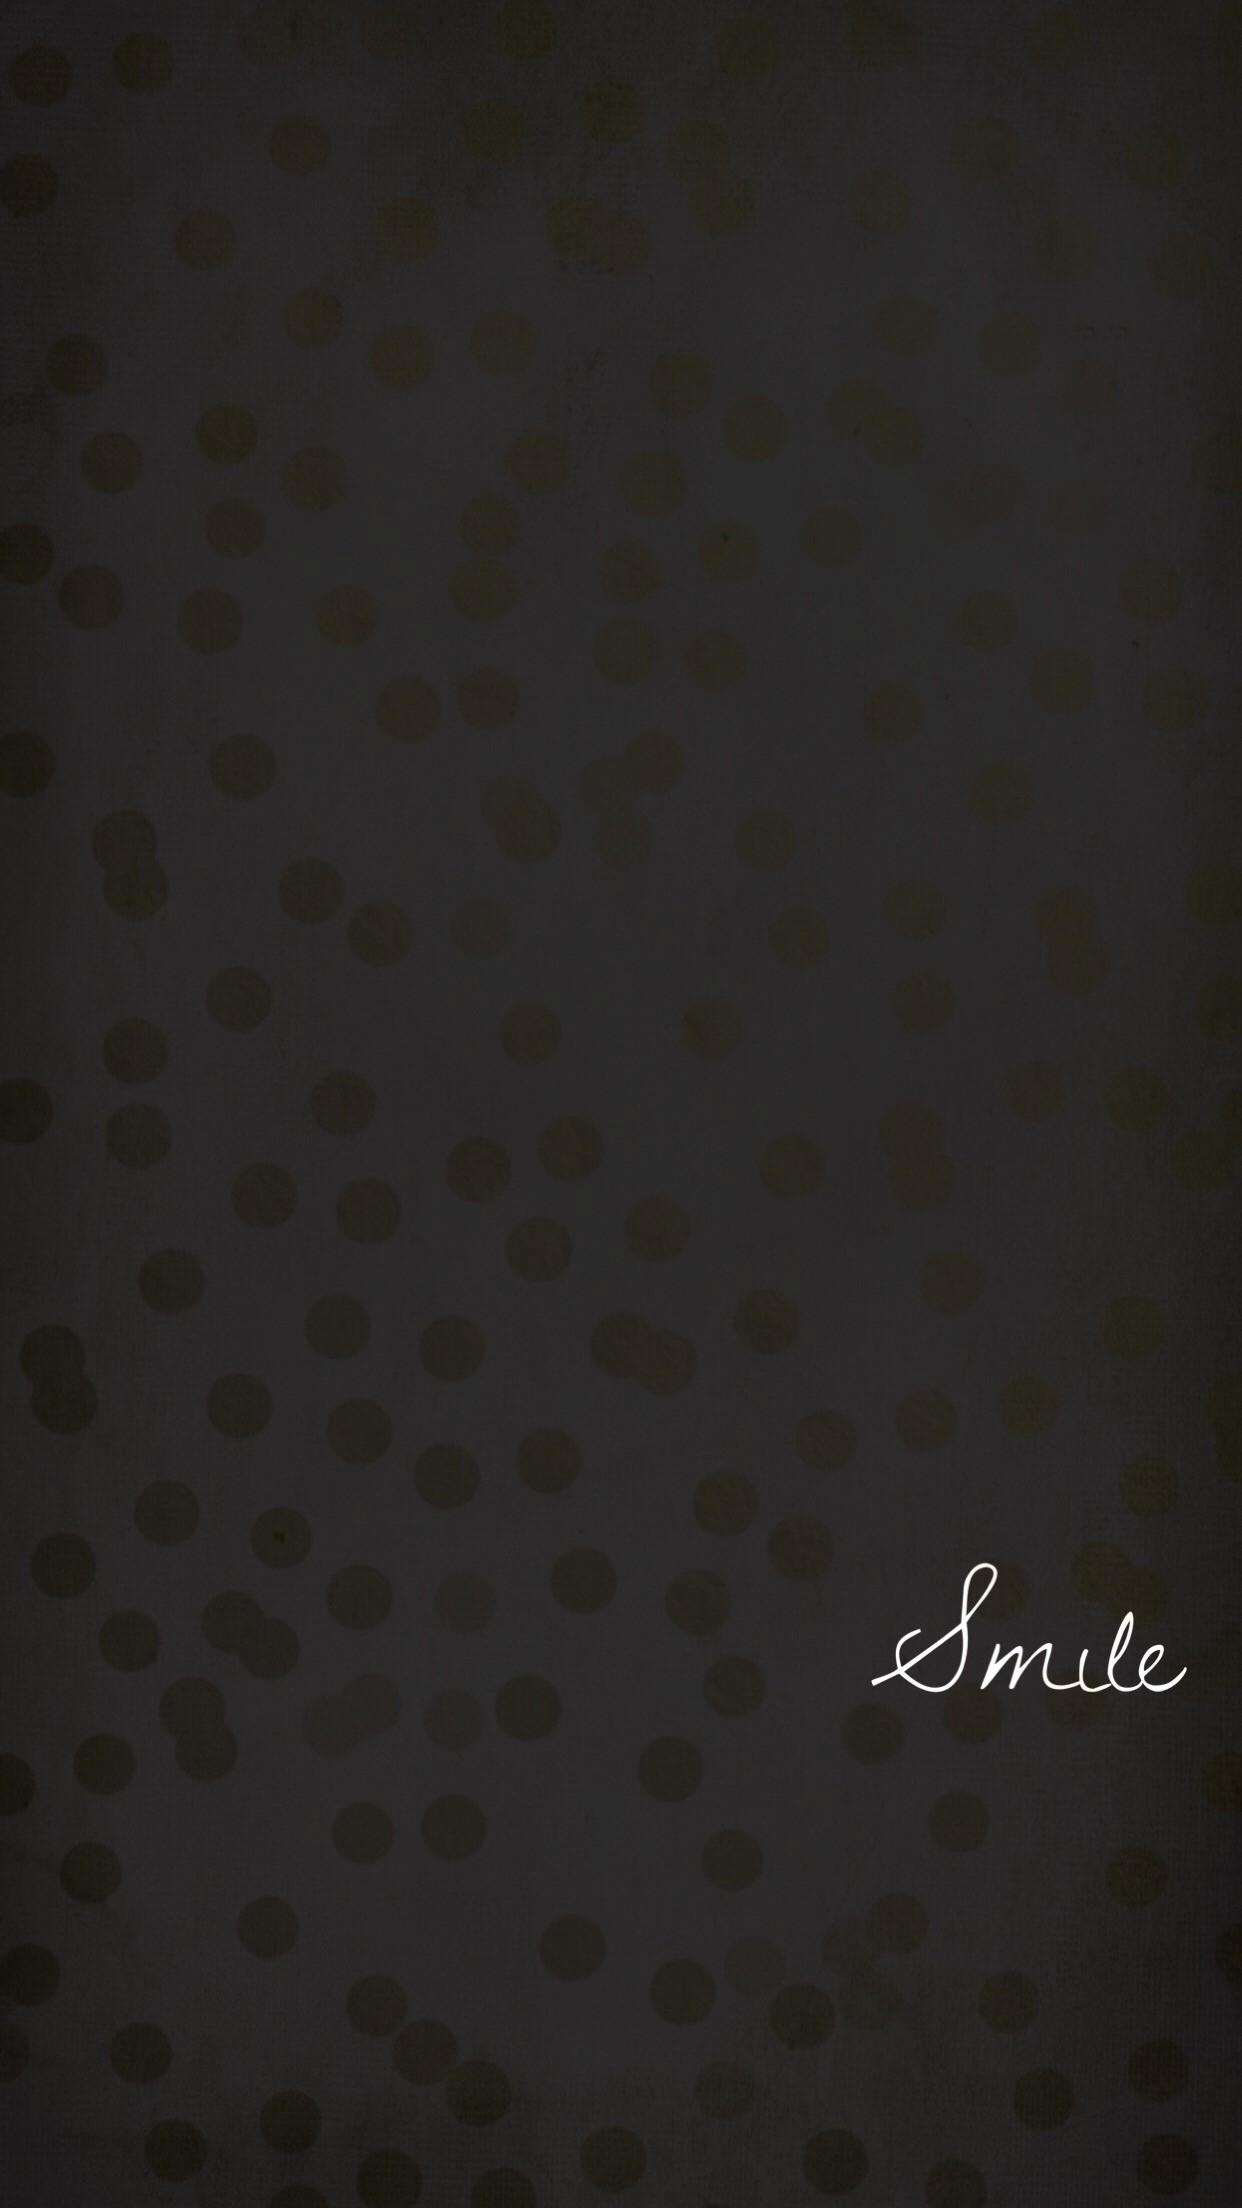 smile, wallpaper, background, black, gold, iphone